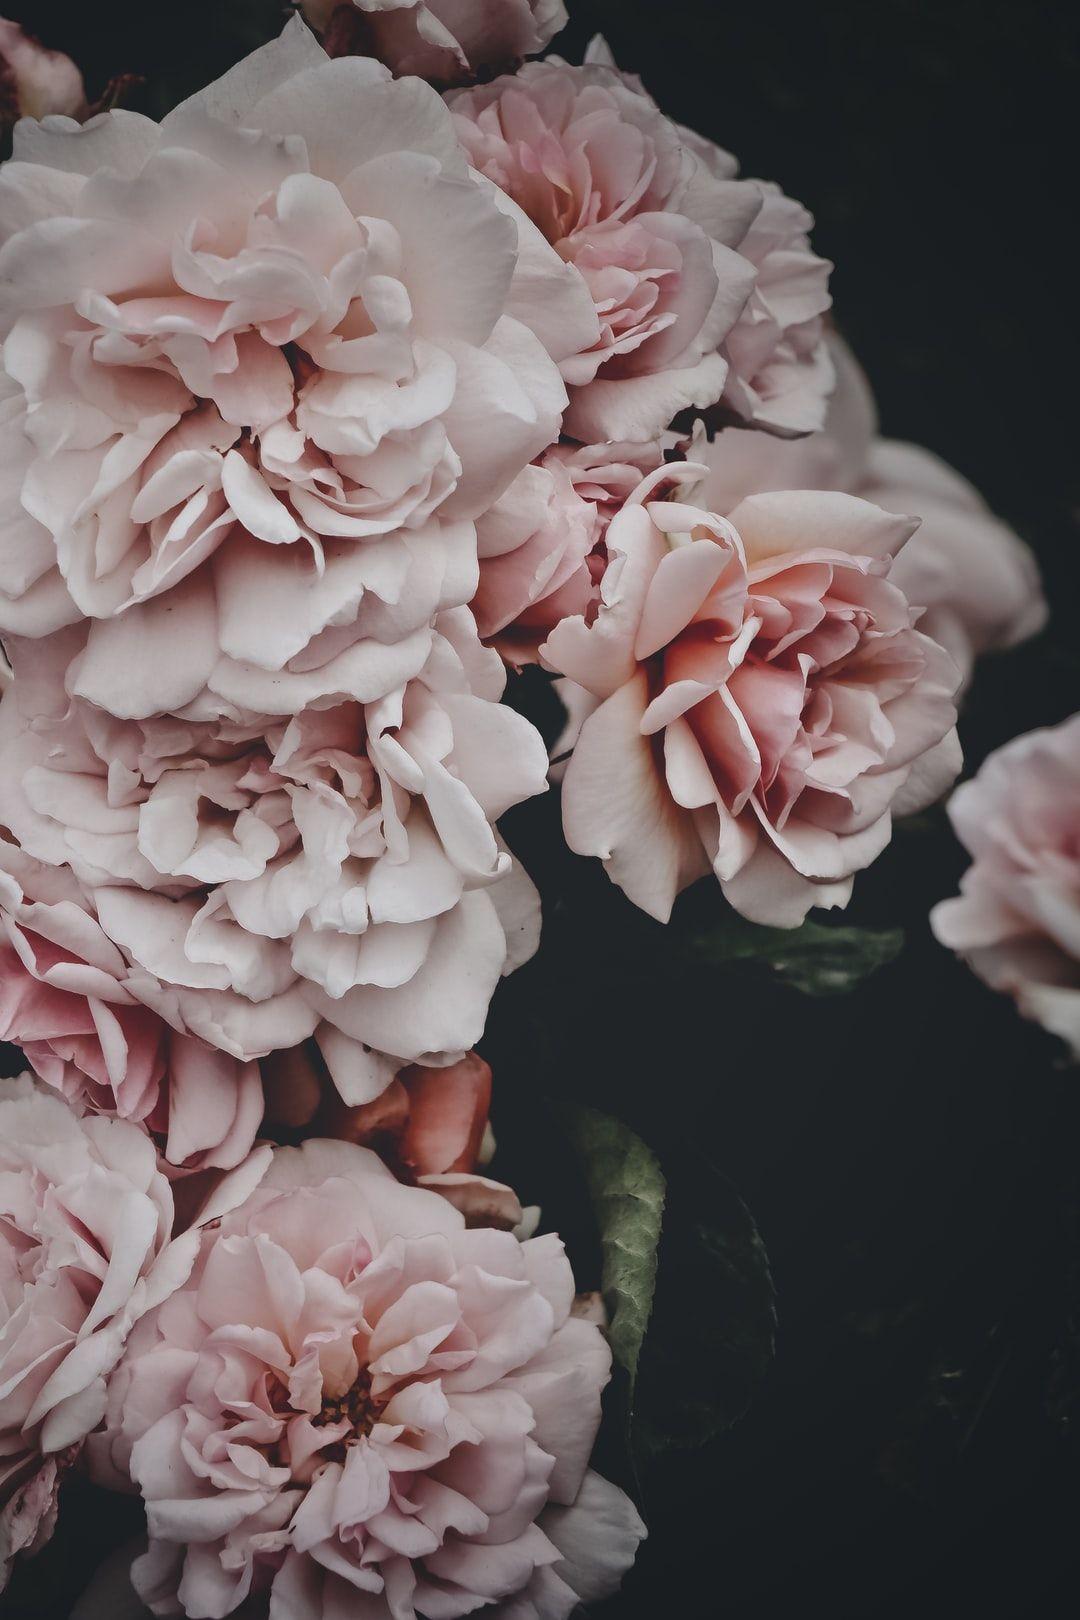 Blush pink peonies flowers HD photo by Embla Munk